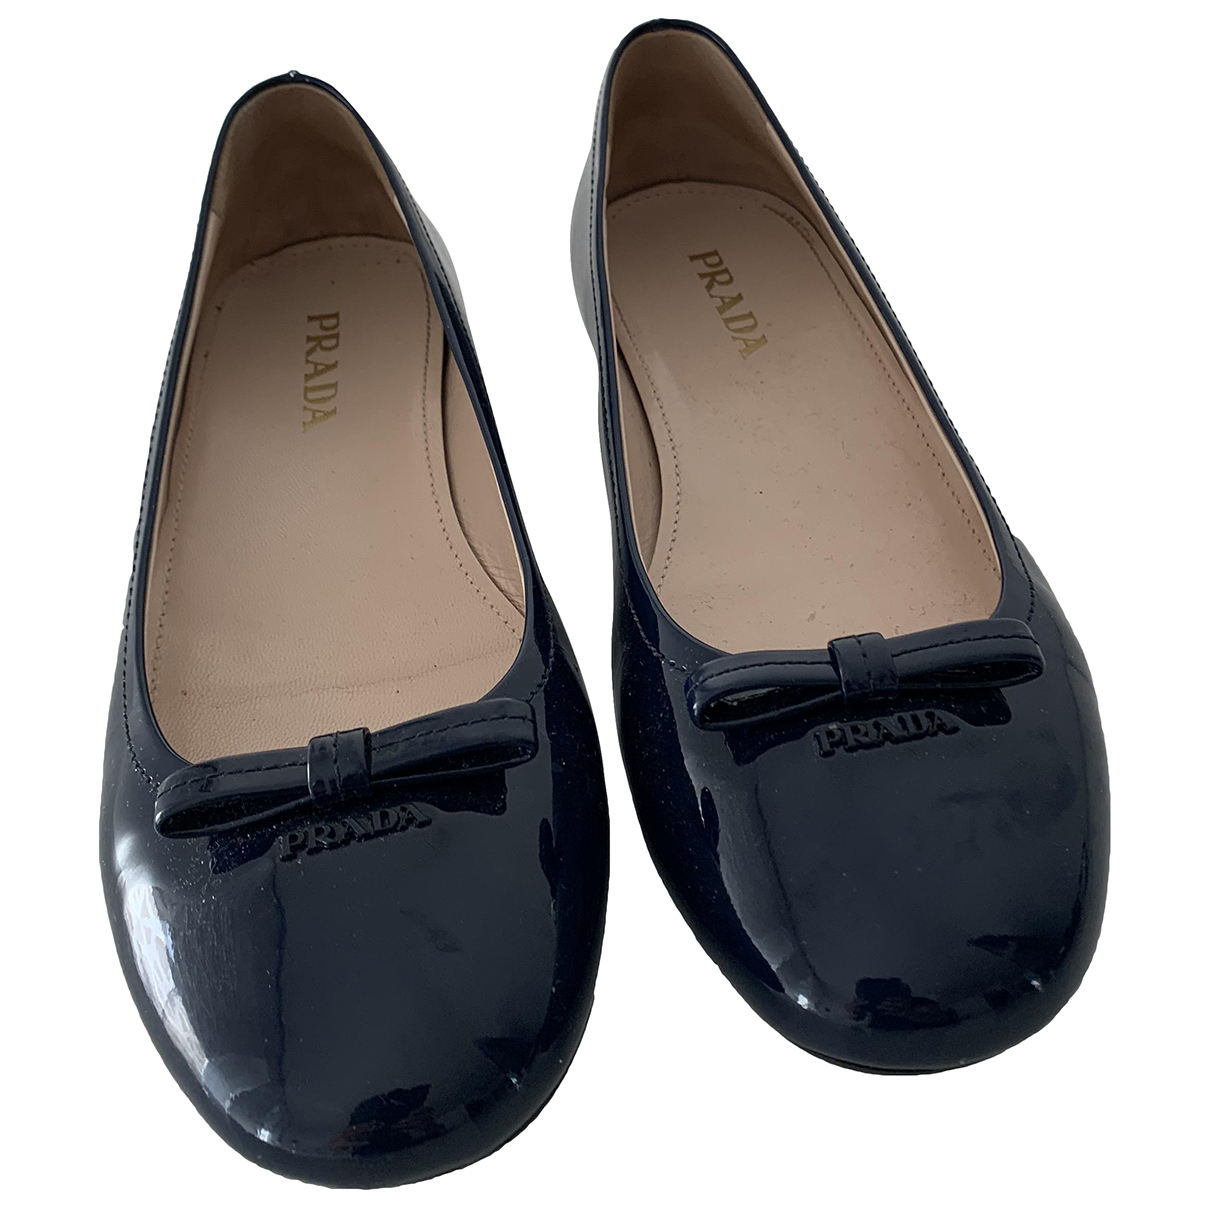 Prada N Blue Patent leather Ballet flats for Women 36.5 EU